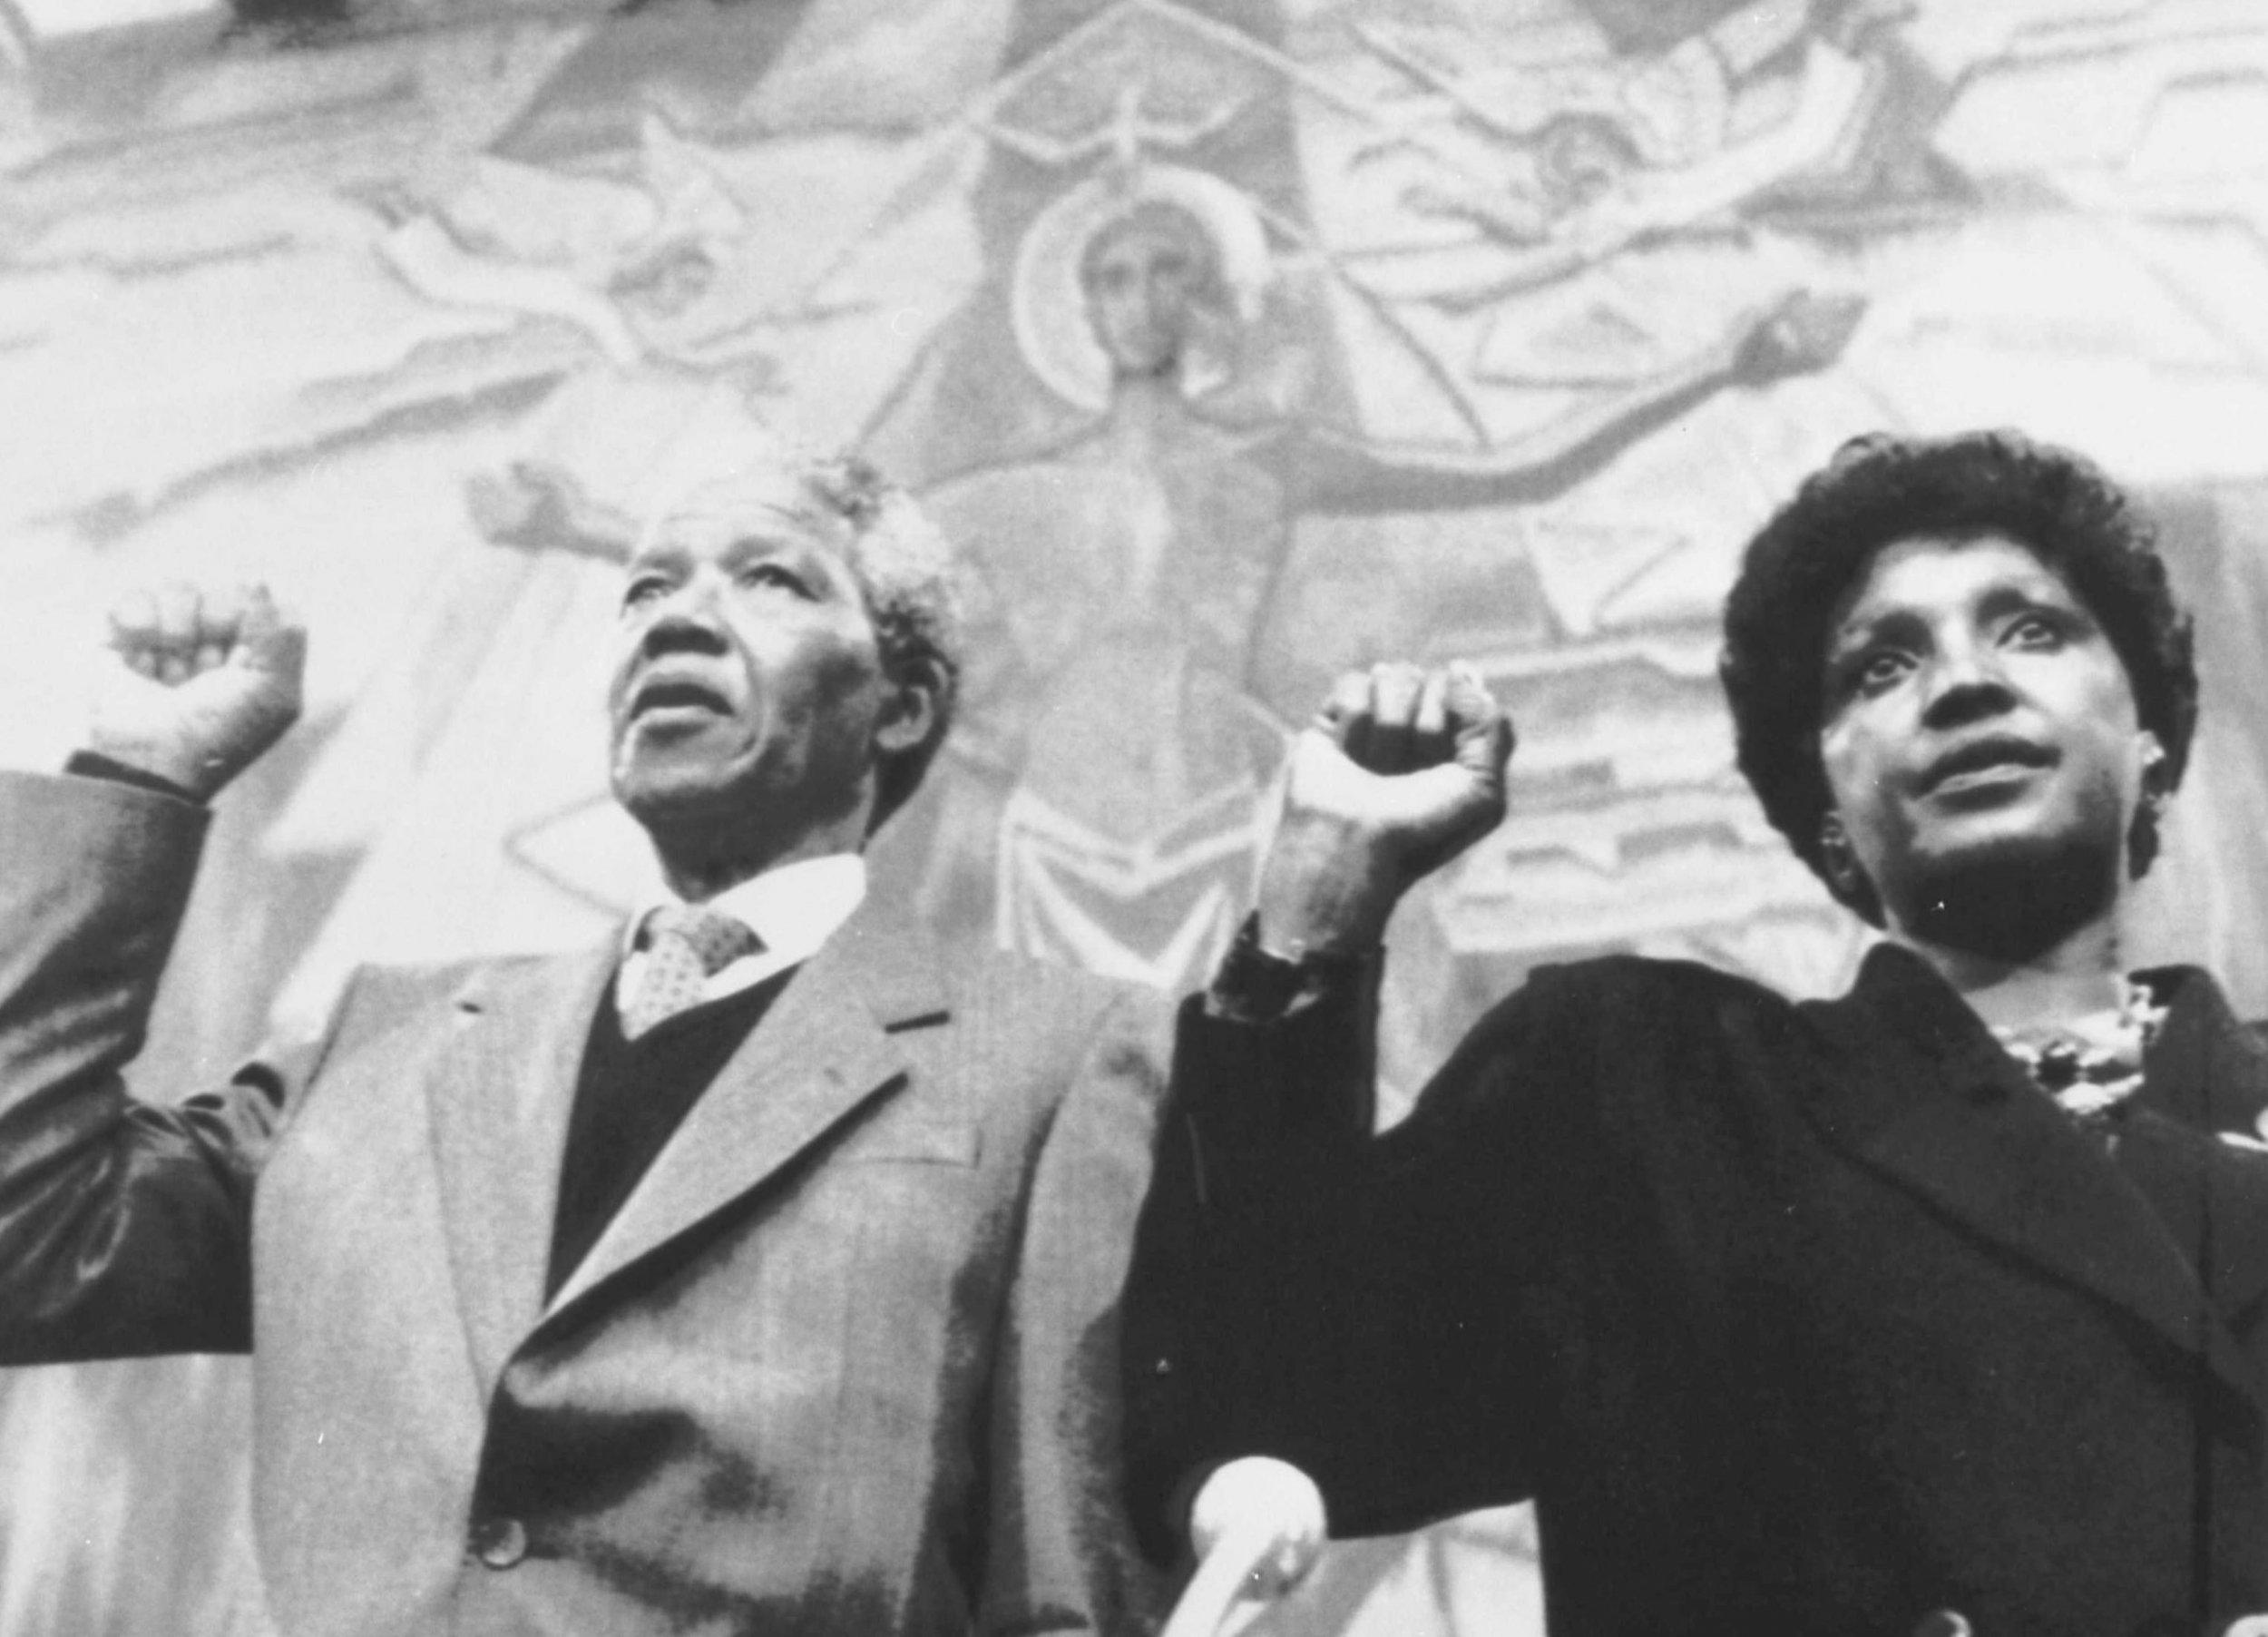 Nelson Mandela and his wife, Winnie Mandela